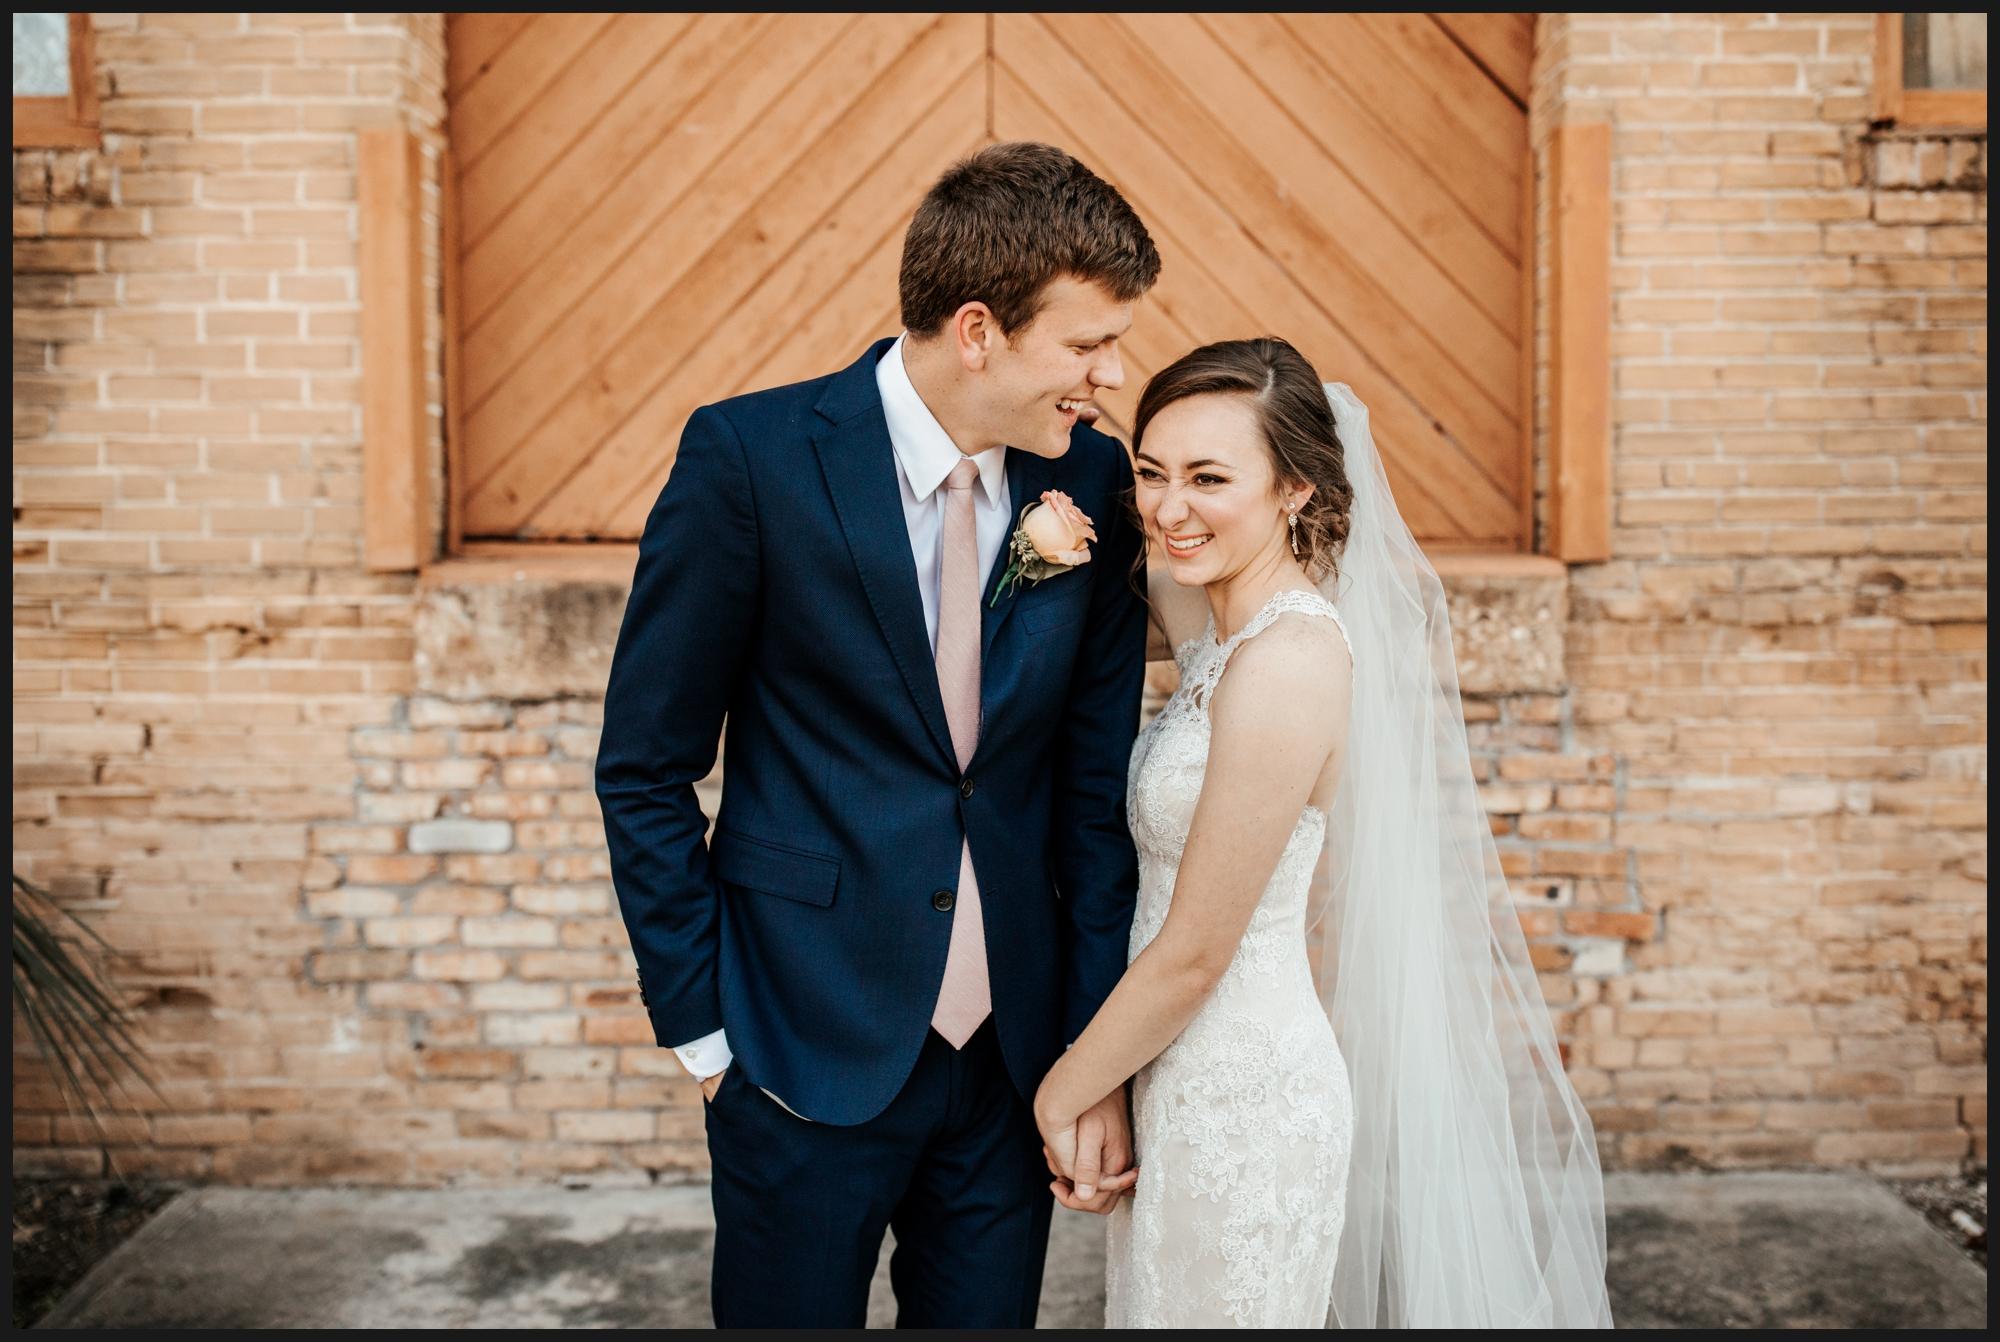 Orlando-Wedding-Photographer-destination-wedding-photographer-florida-wedding-photographer-bohemian-wedding-photographer_1761.jpg